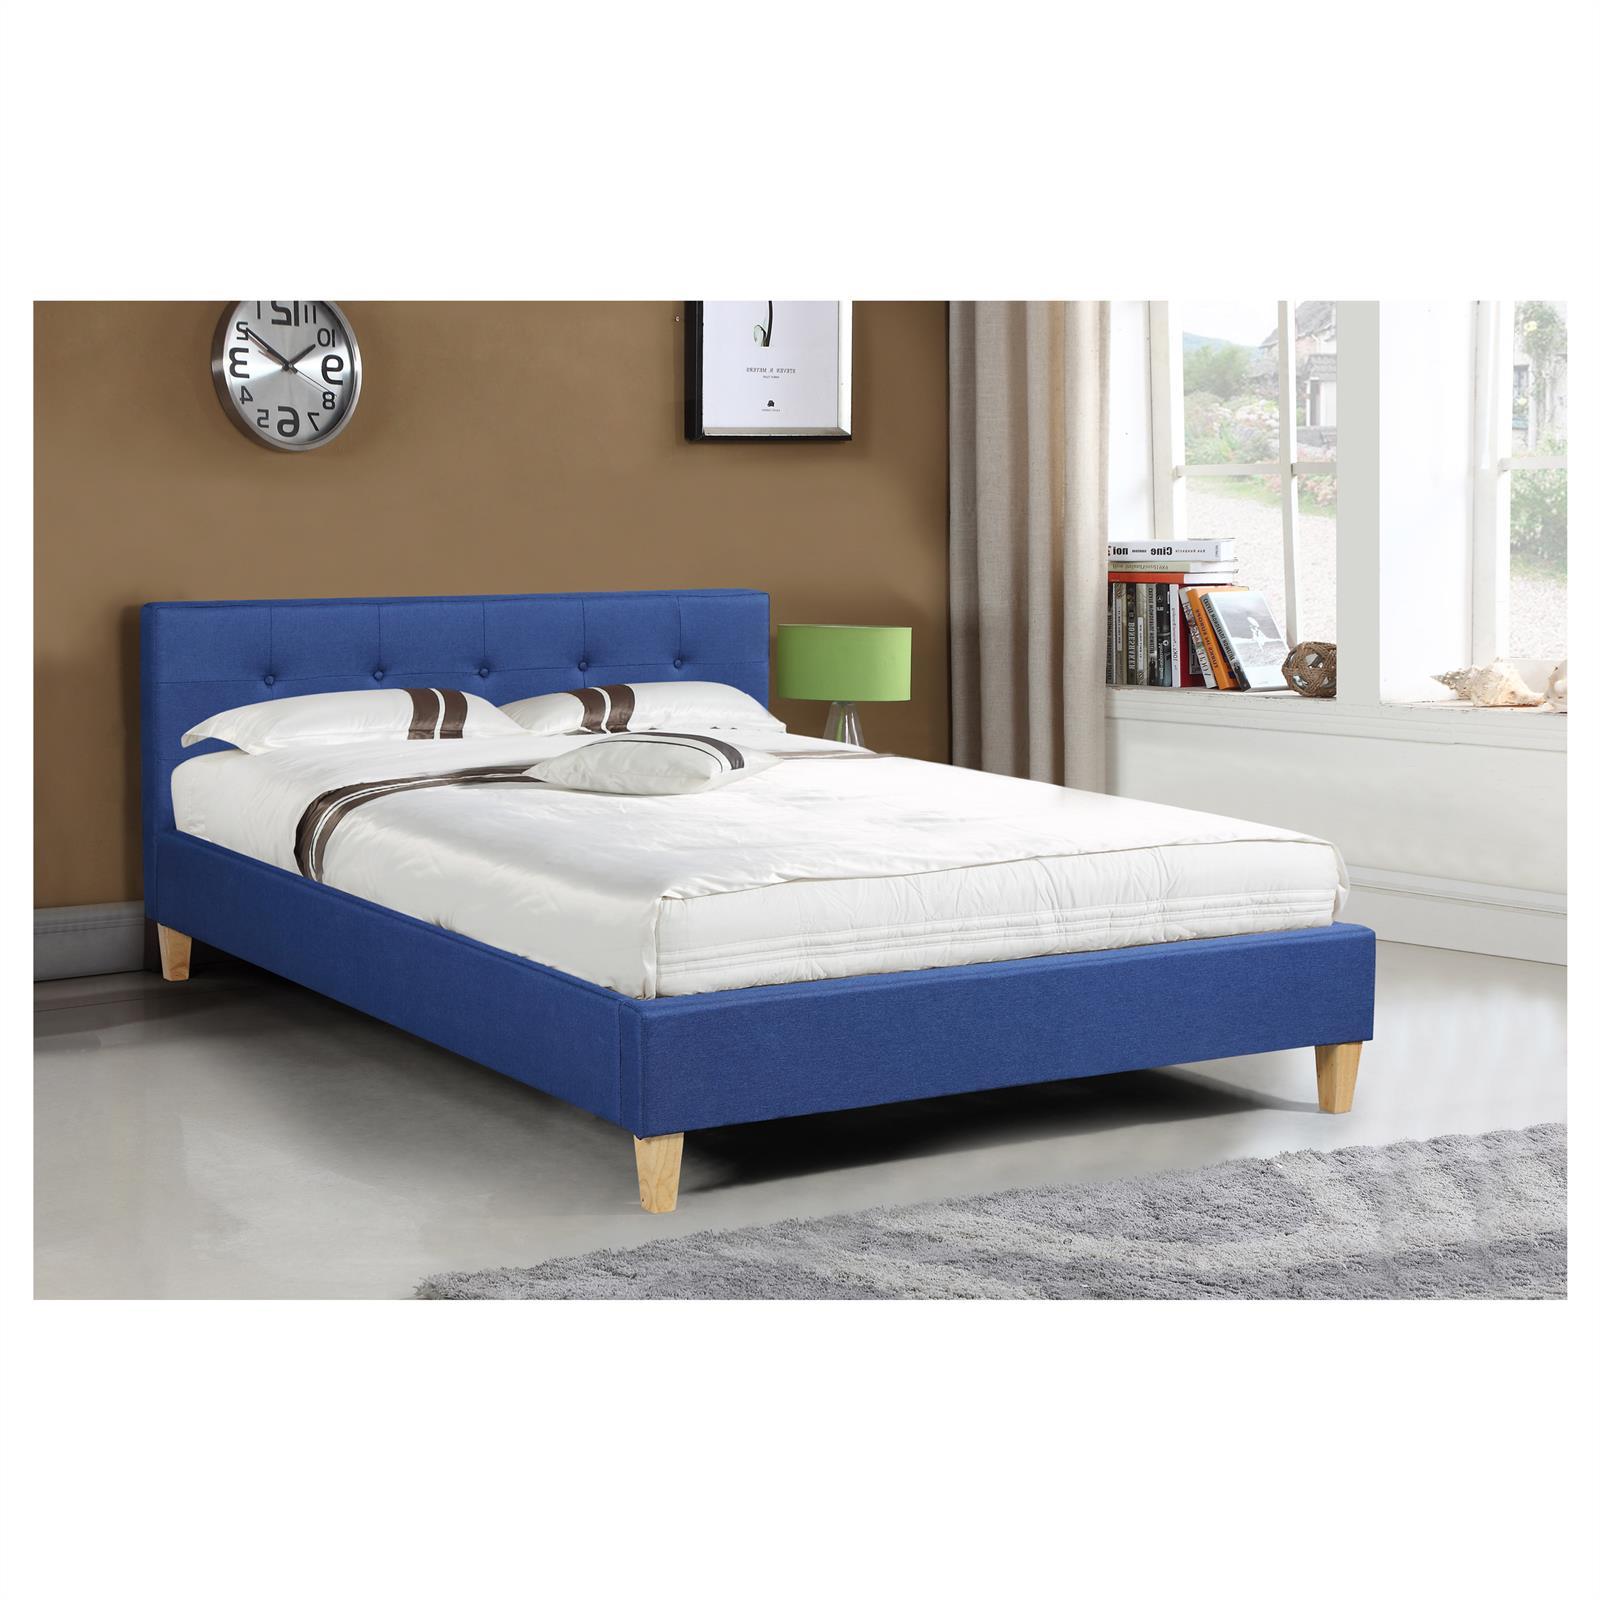 polsterbett doppelbett bettgestell 140x200 cm rollrost. Black Bedroom Furniture Sets. Home Design Ideas